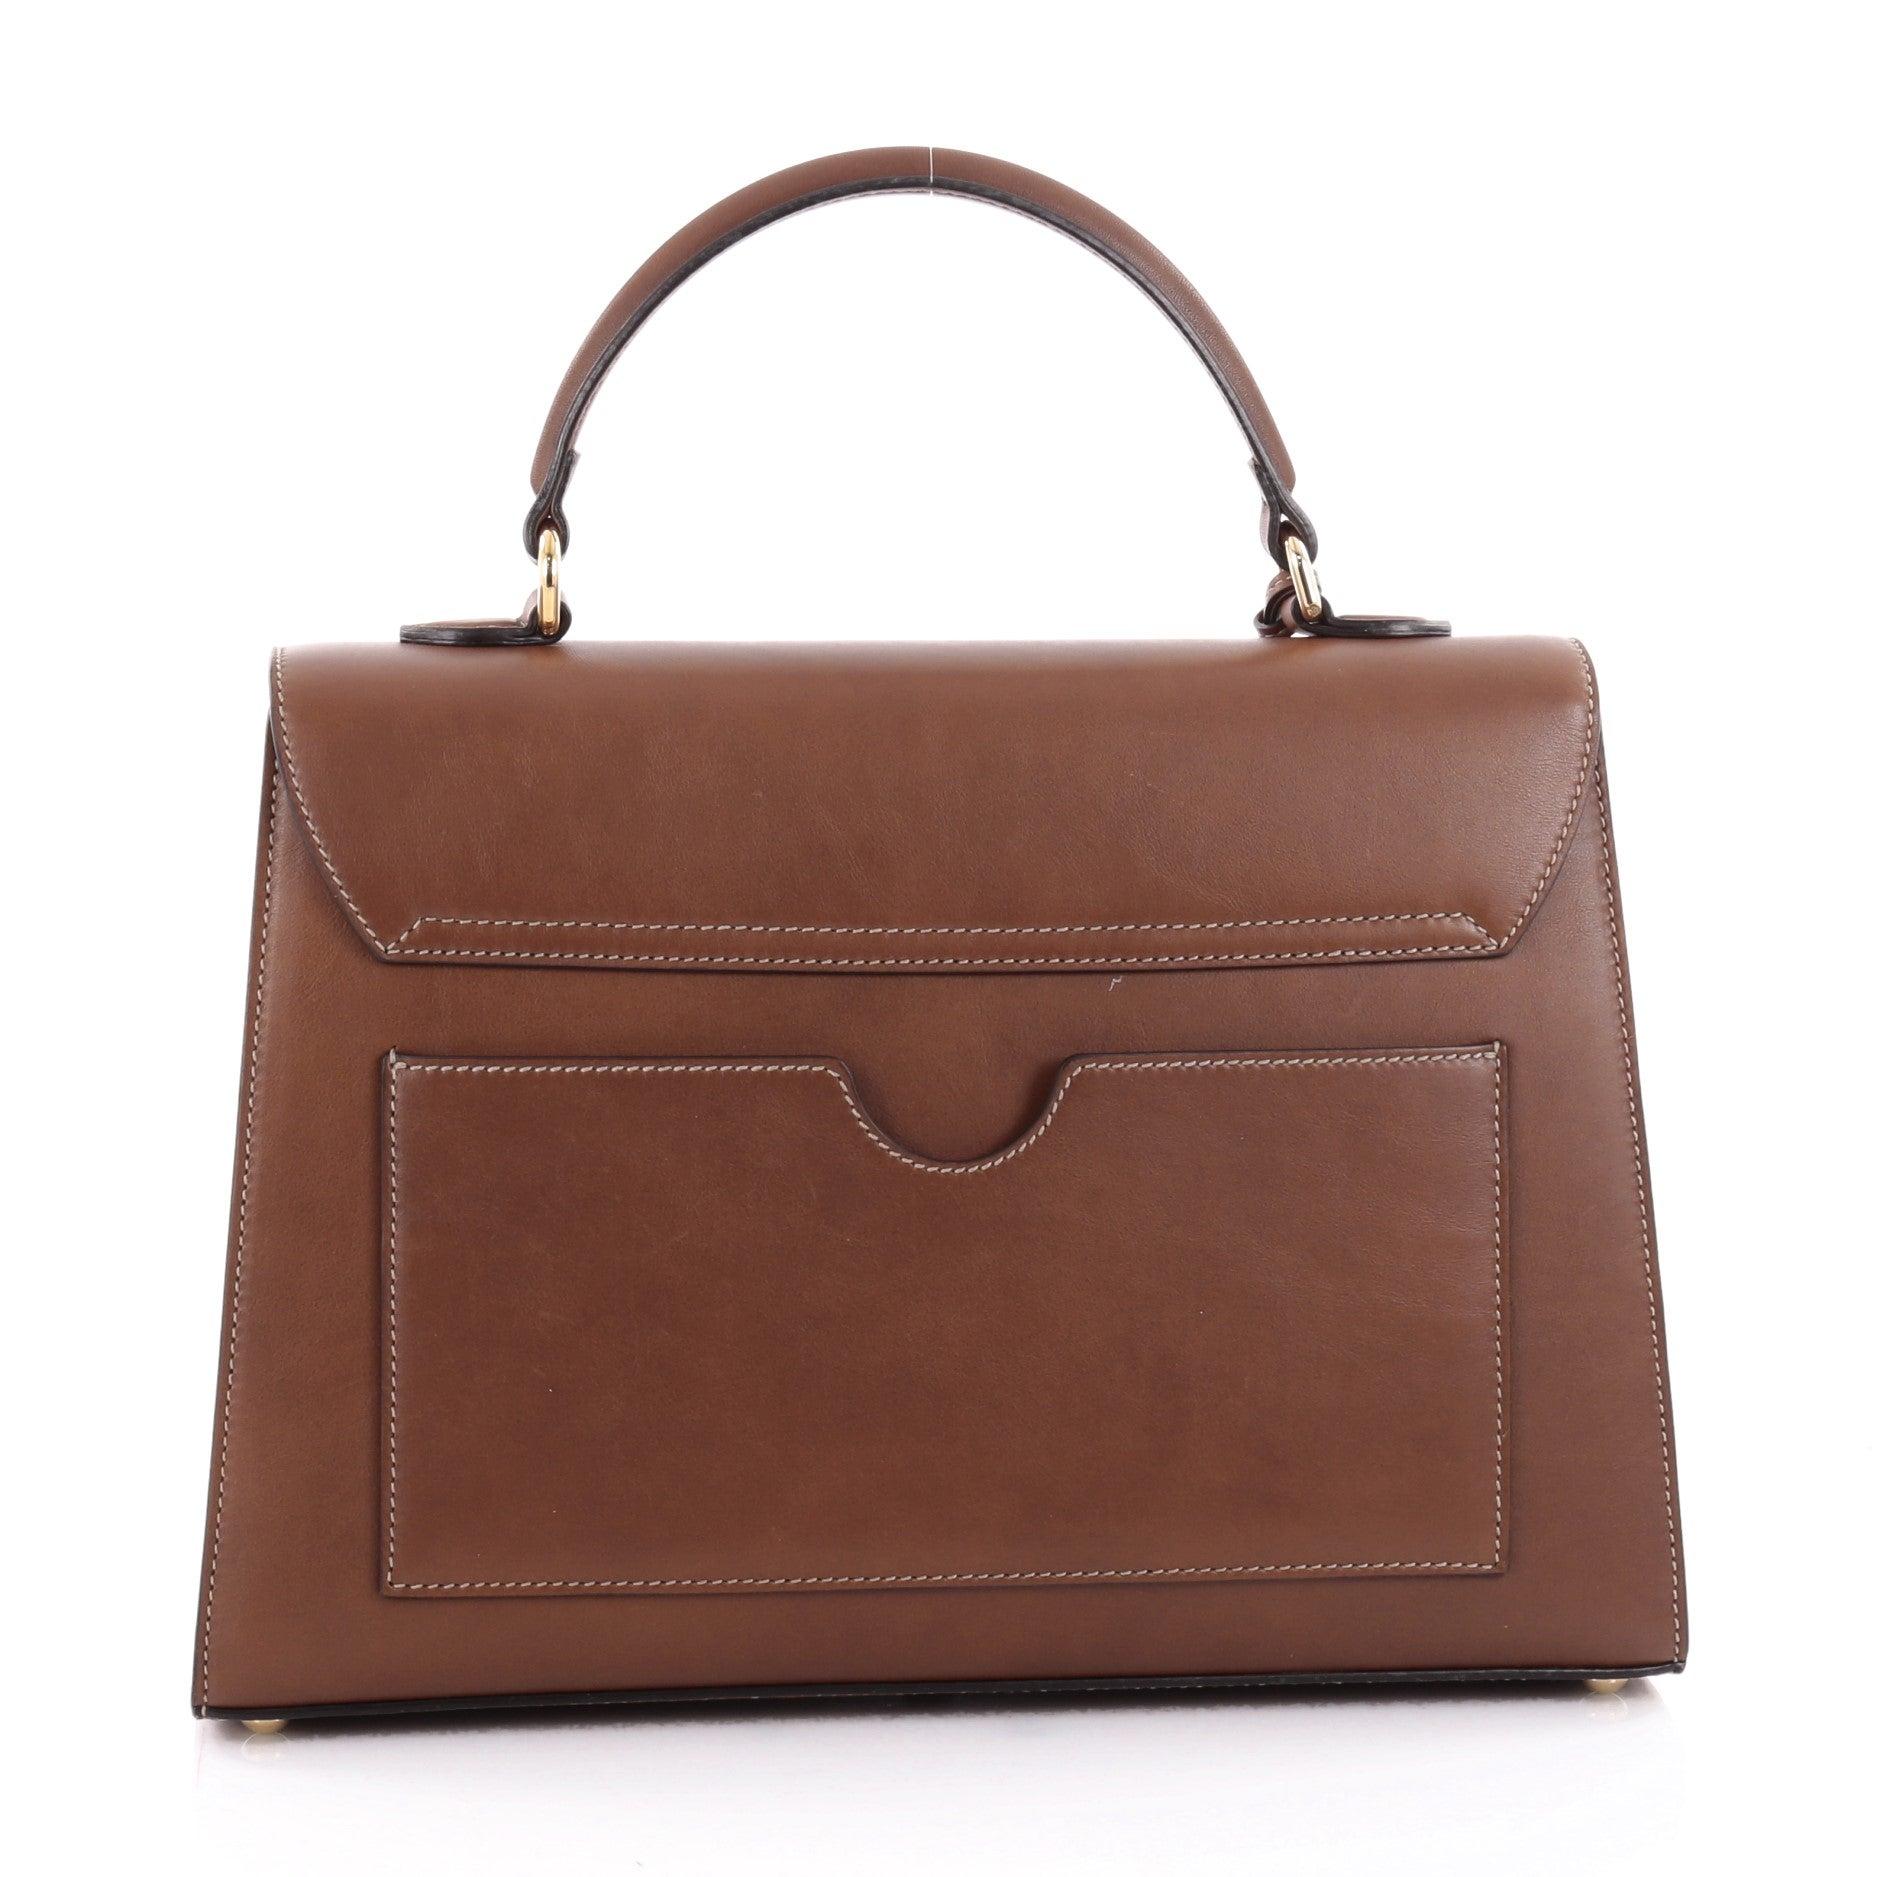 2bbd3636e3f1 Gucci Padlock Top Handle Bag Leather Medium at 1stdibs